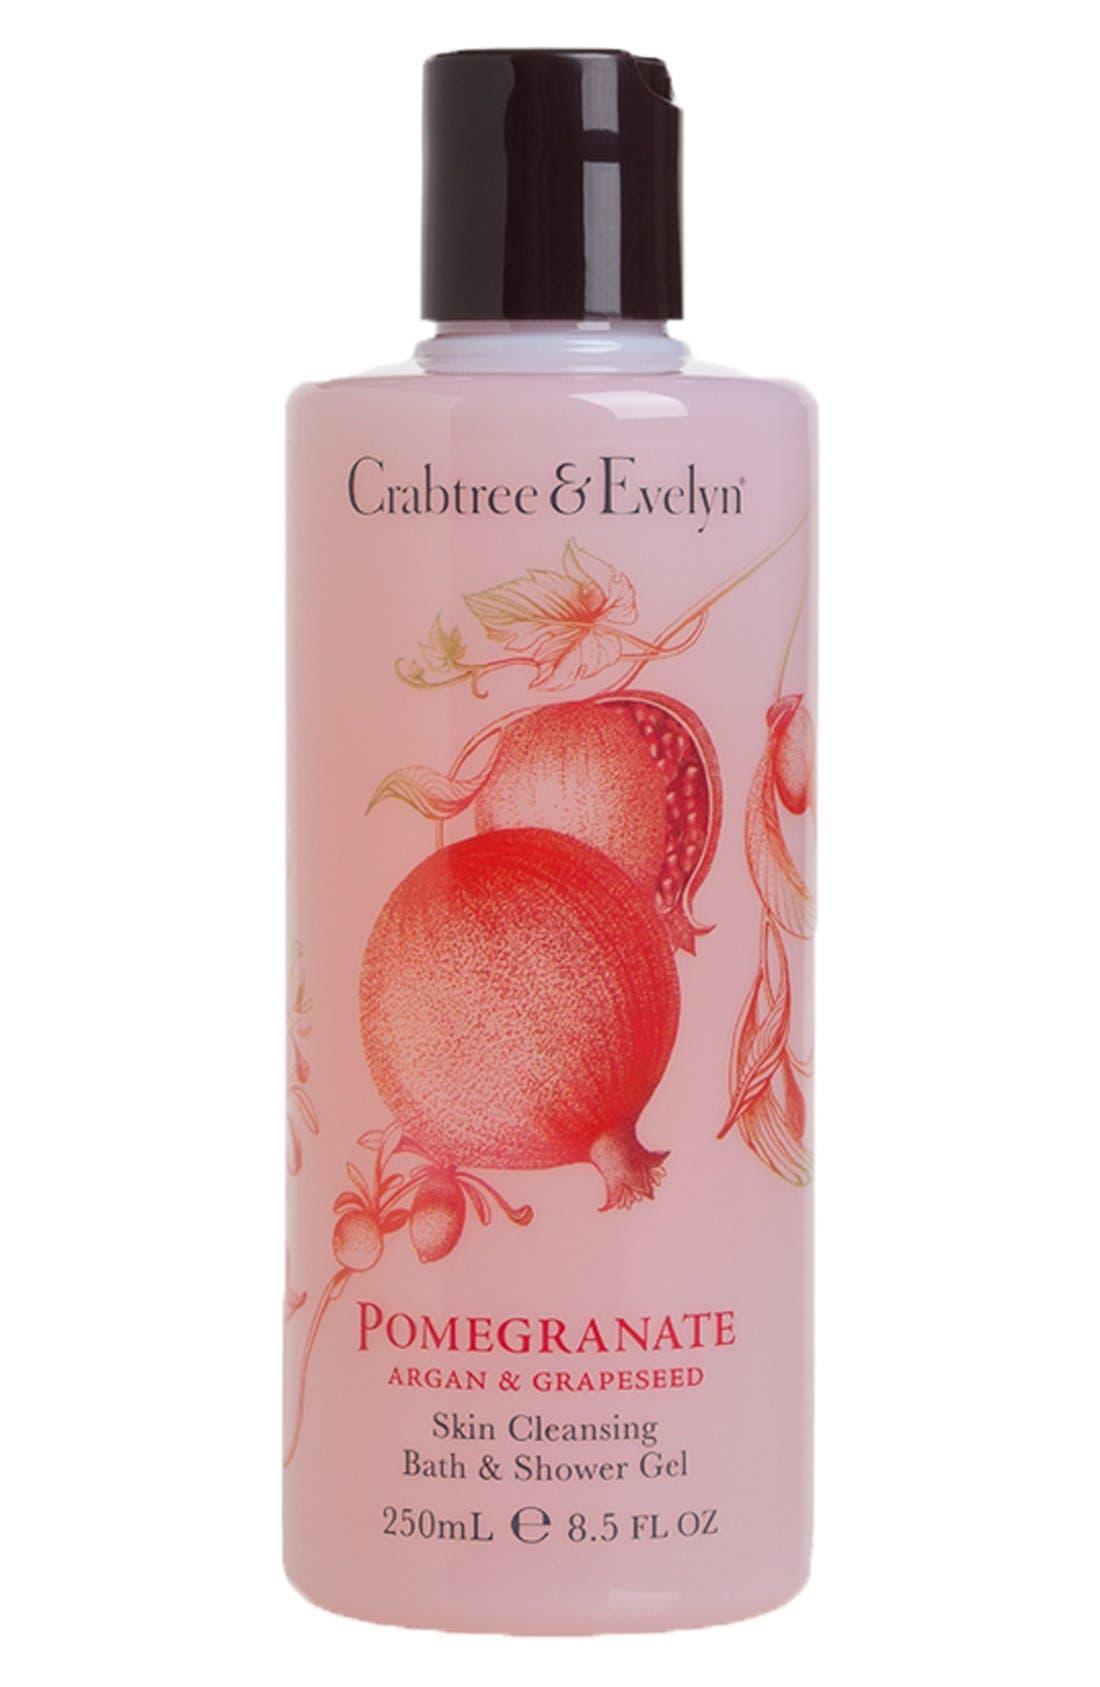 Crabtree & Evelyn 'Pomegranate, Argan & Grapeseed' Skin Cleansing Bath & Shower Gel